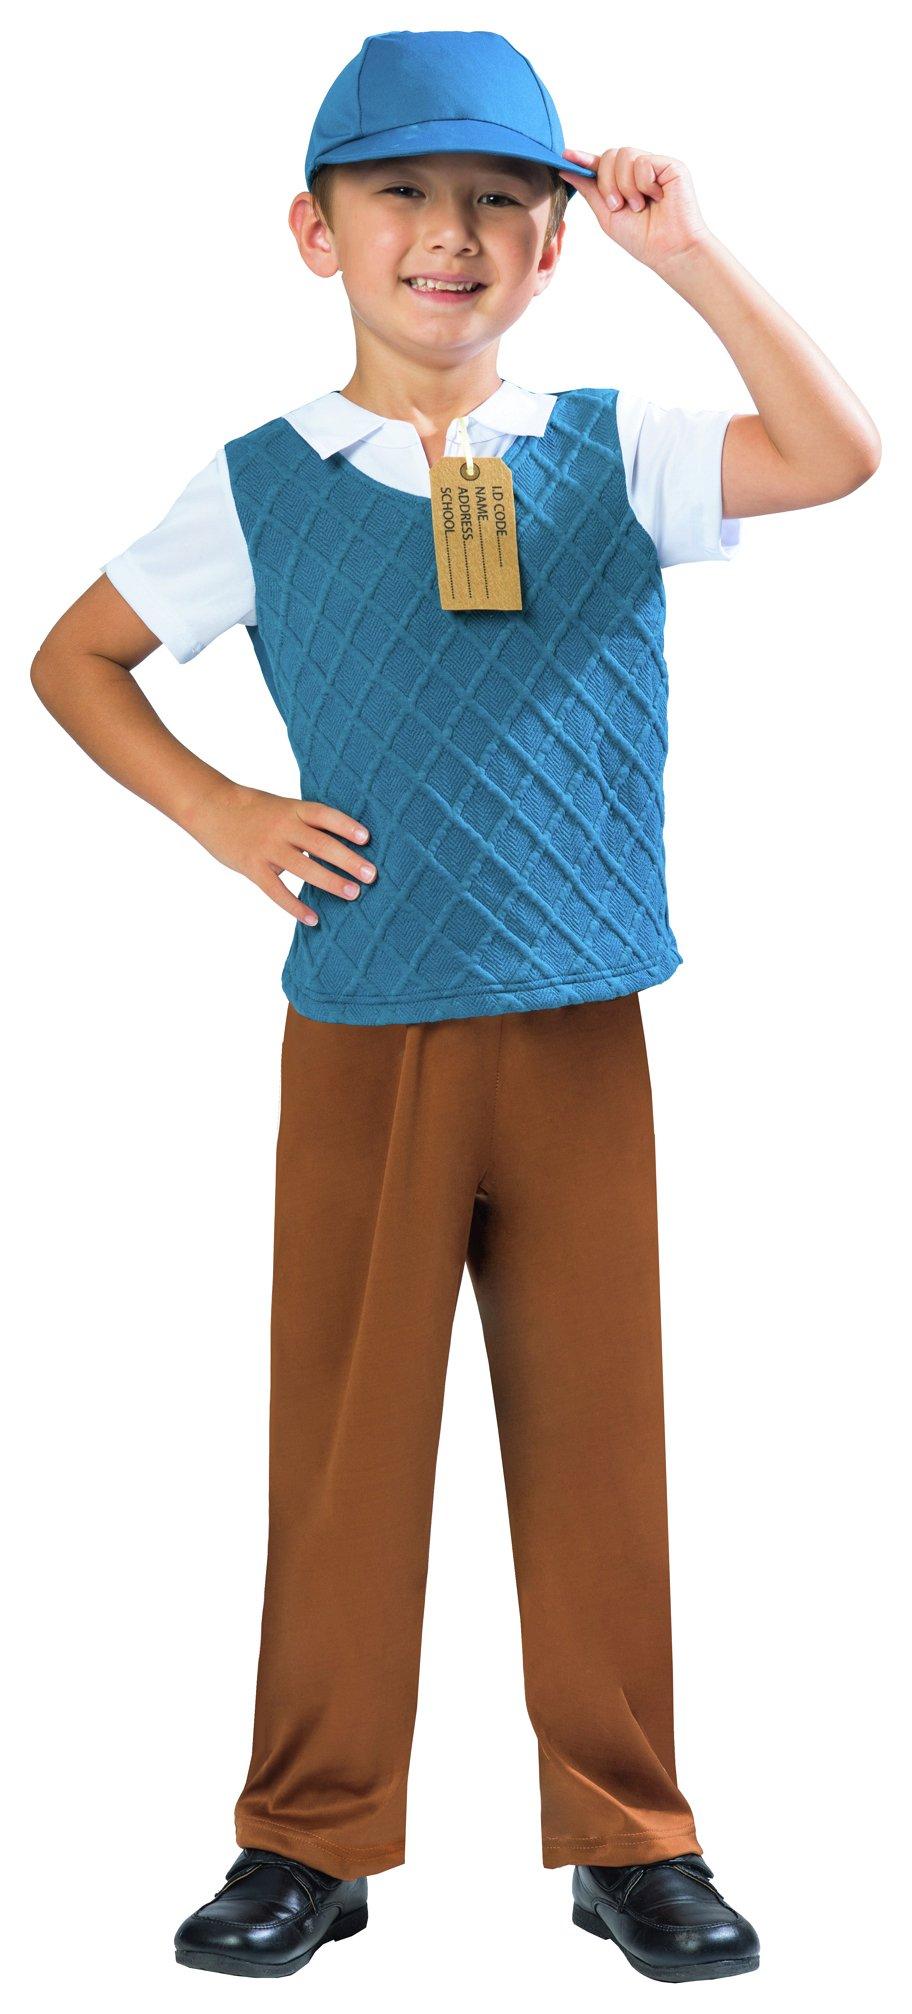 Image of Amscan Evacuee Boy Costume - 5 - 6 Years.